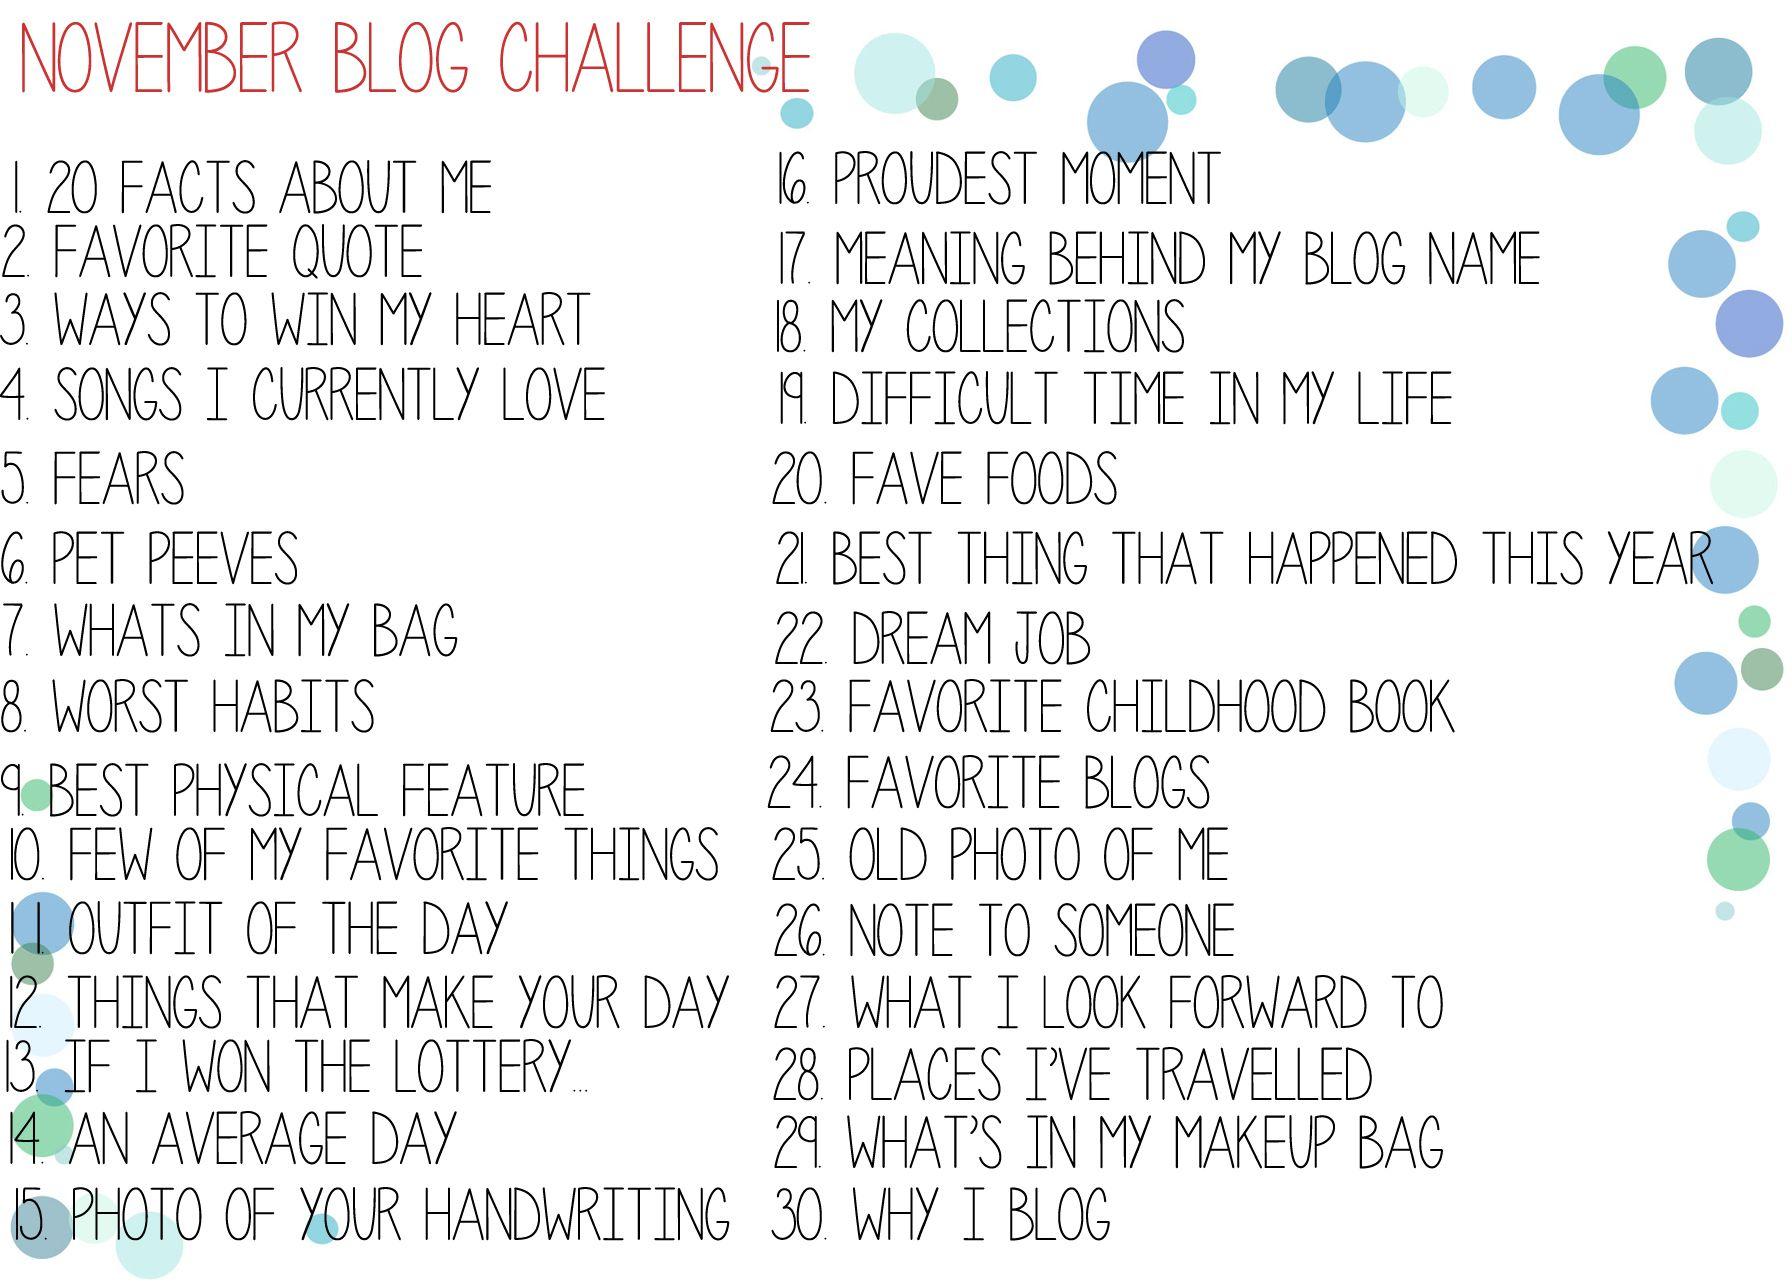 Kristazzi: November Blog Challenge